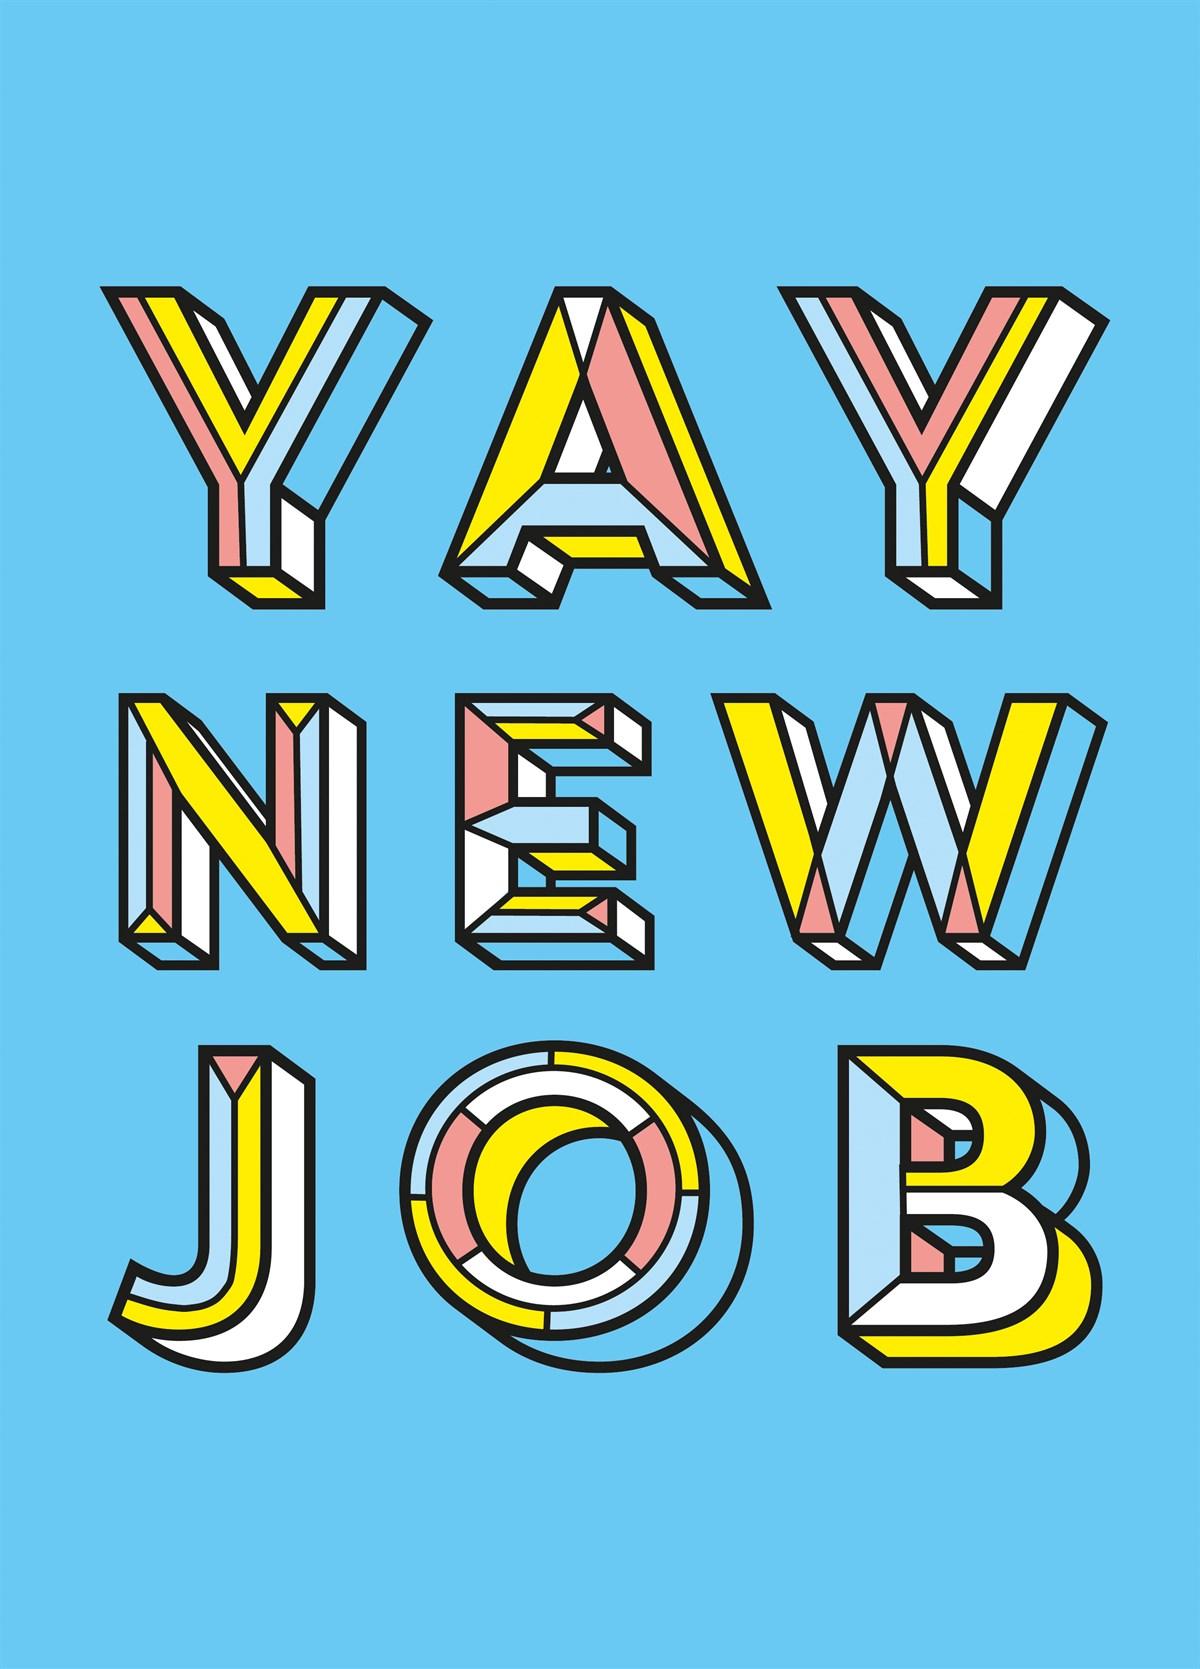 Yay New Job Enjoy the meme 'yay good job' uploaded by gamerplayer. yay new job